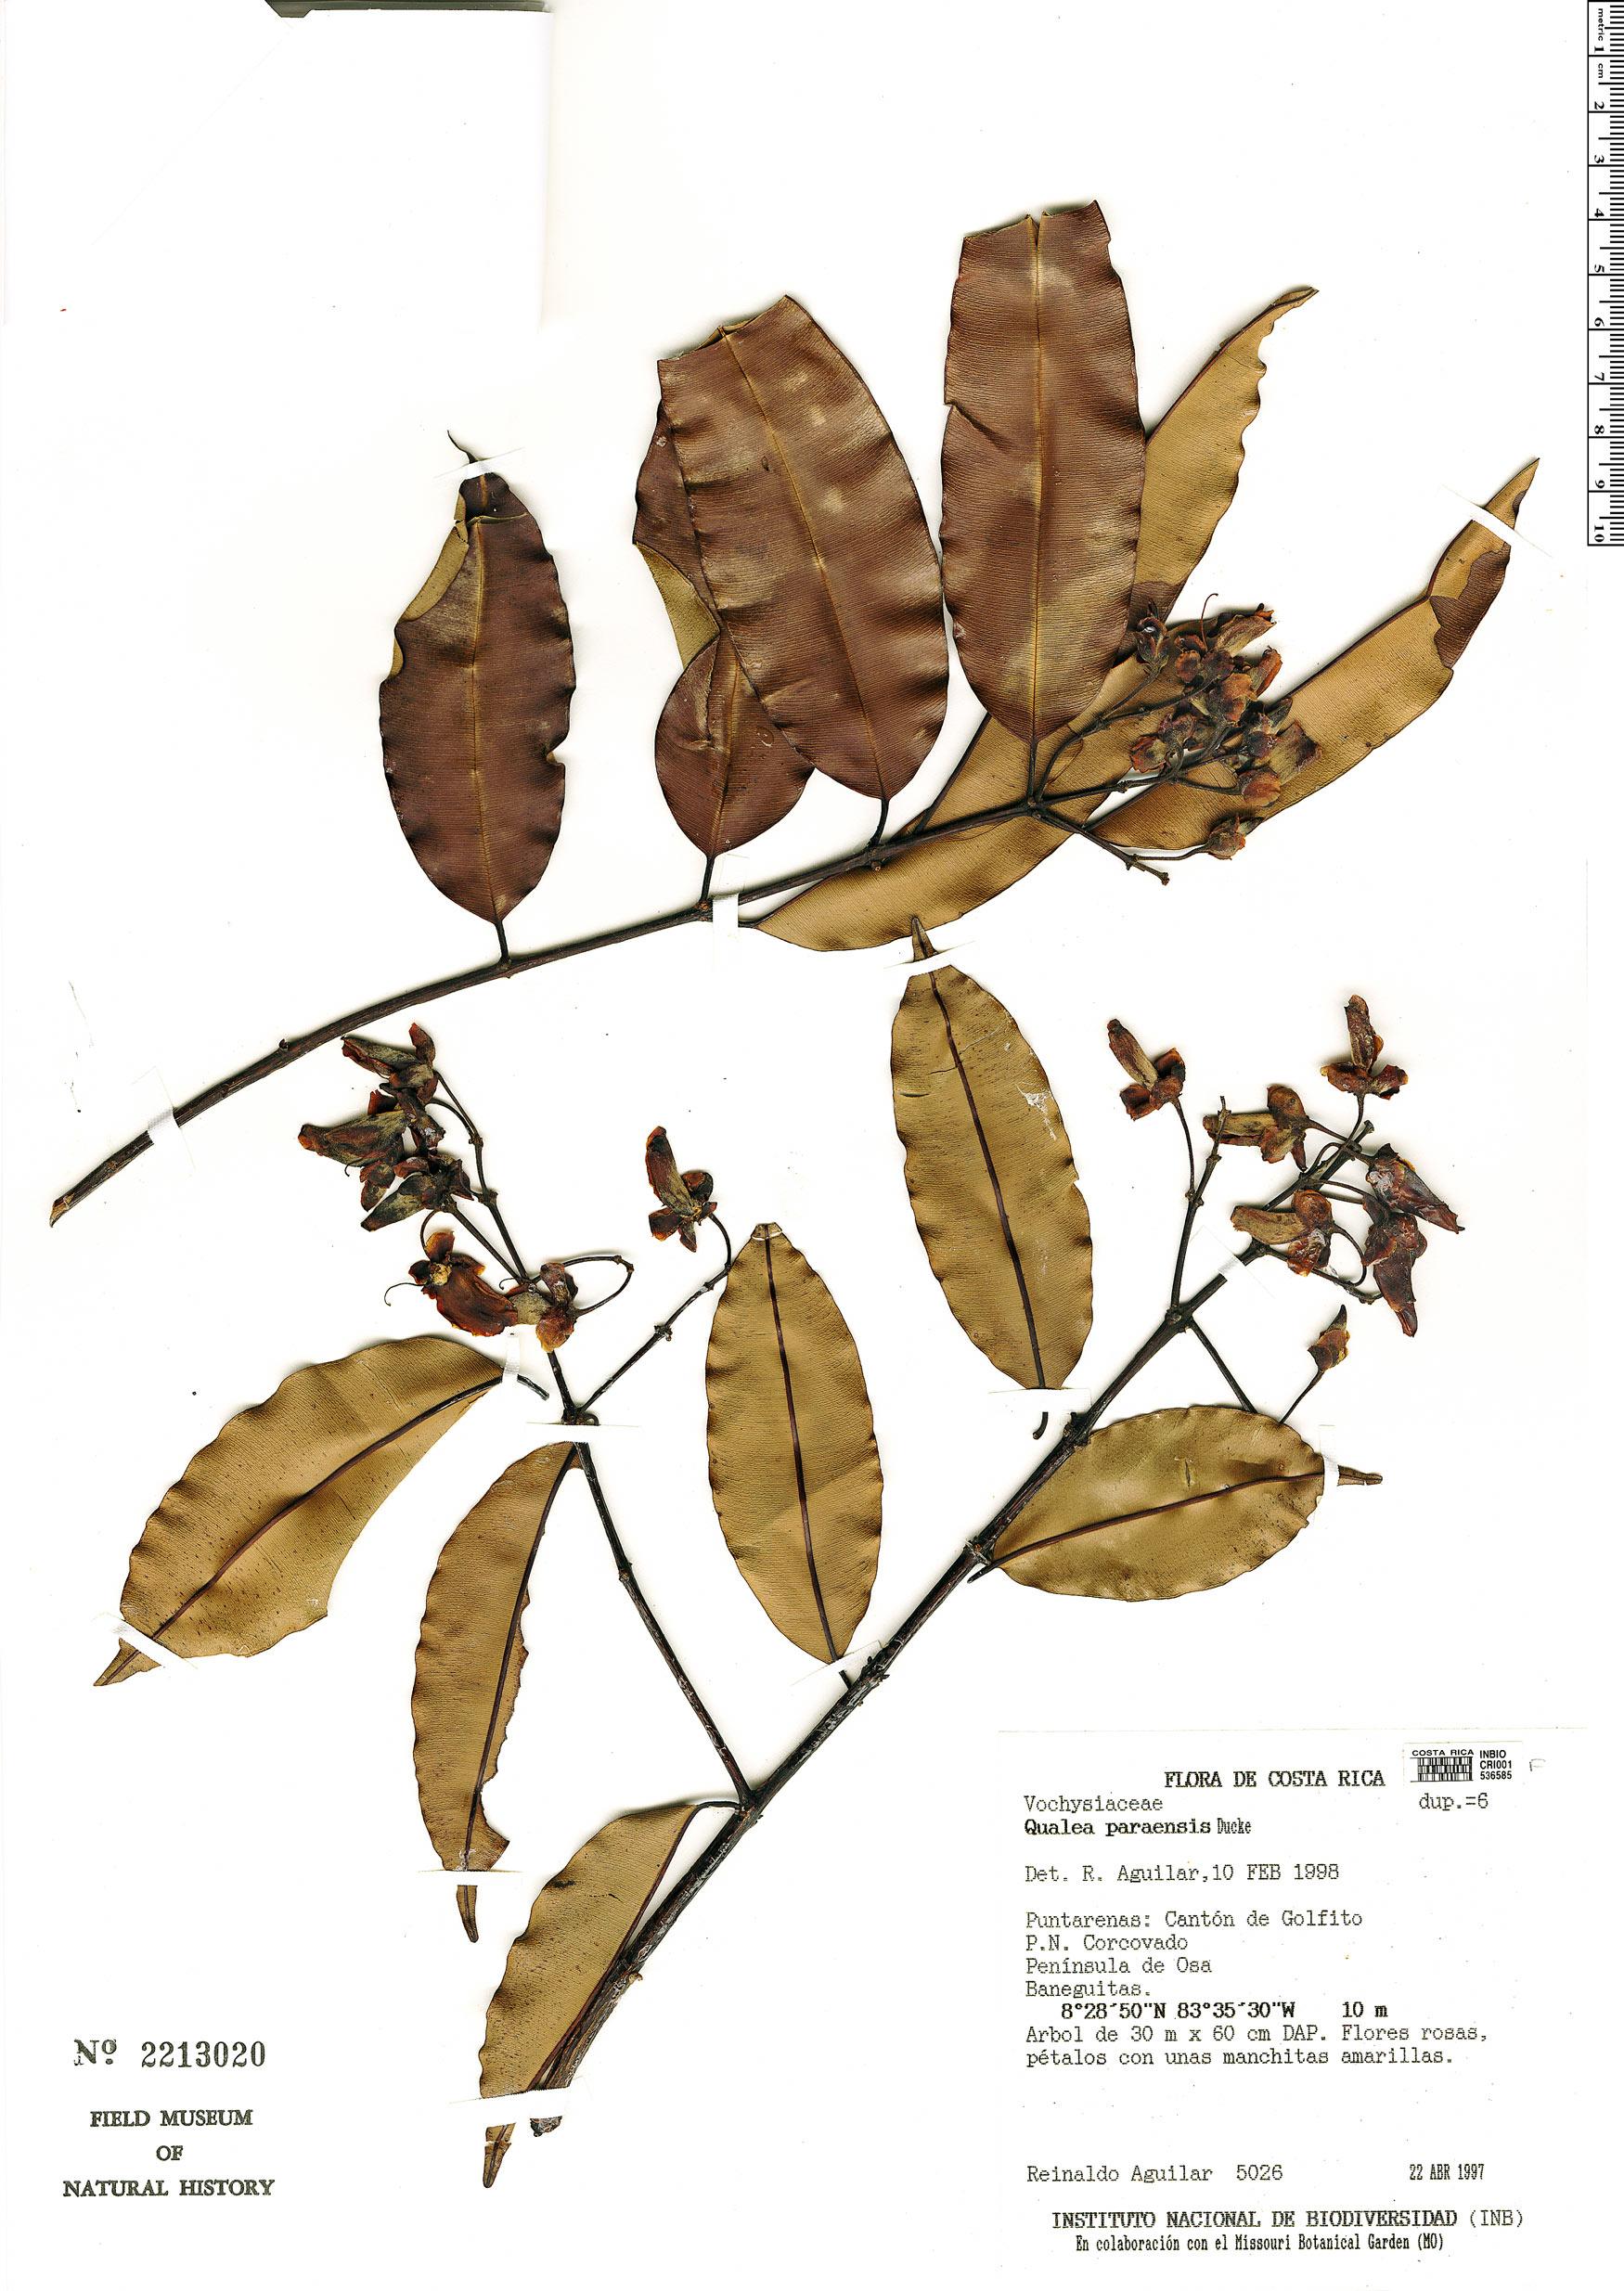 Espécimen: Qualea paraensis